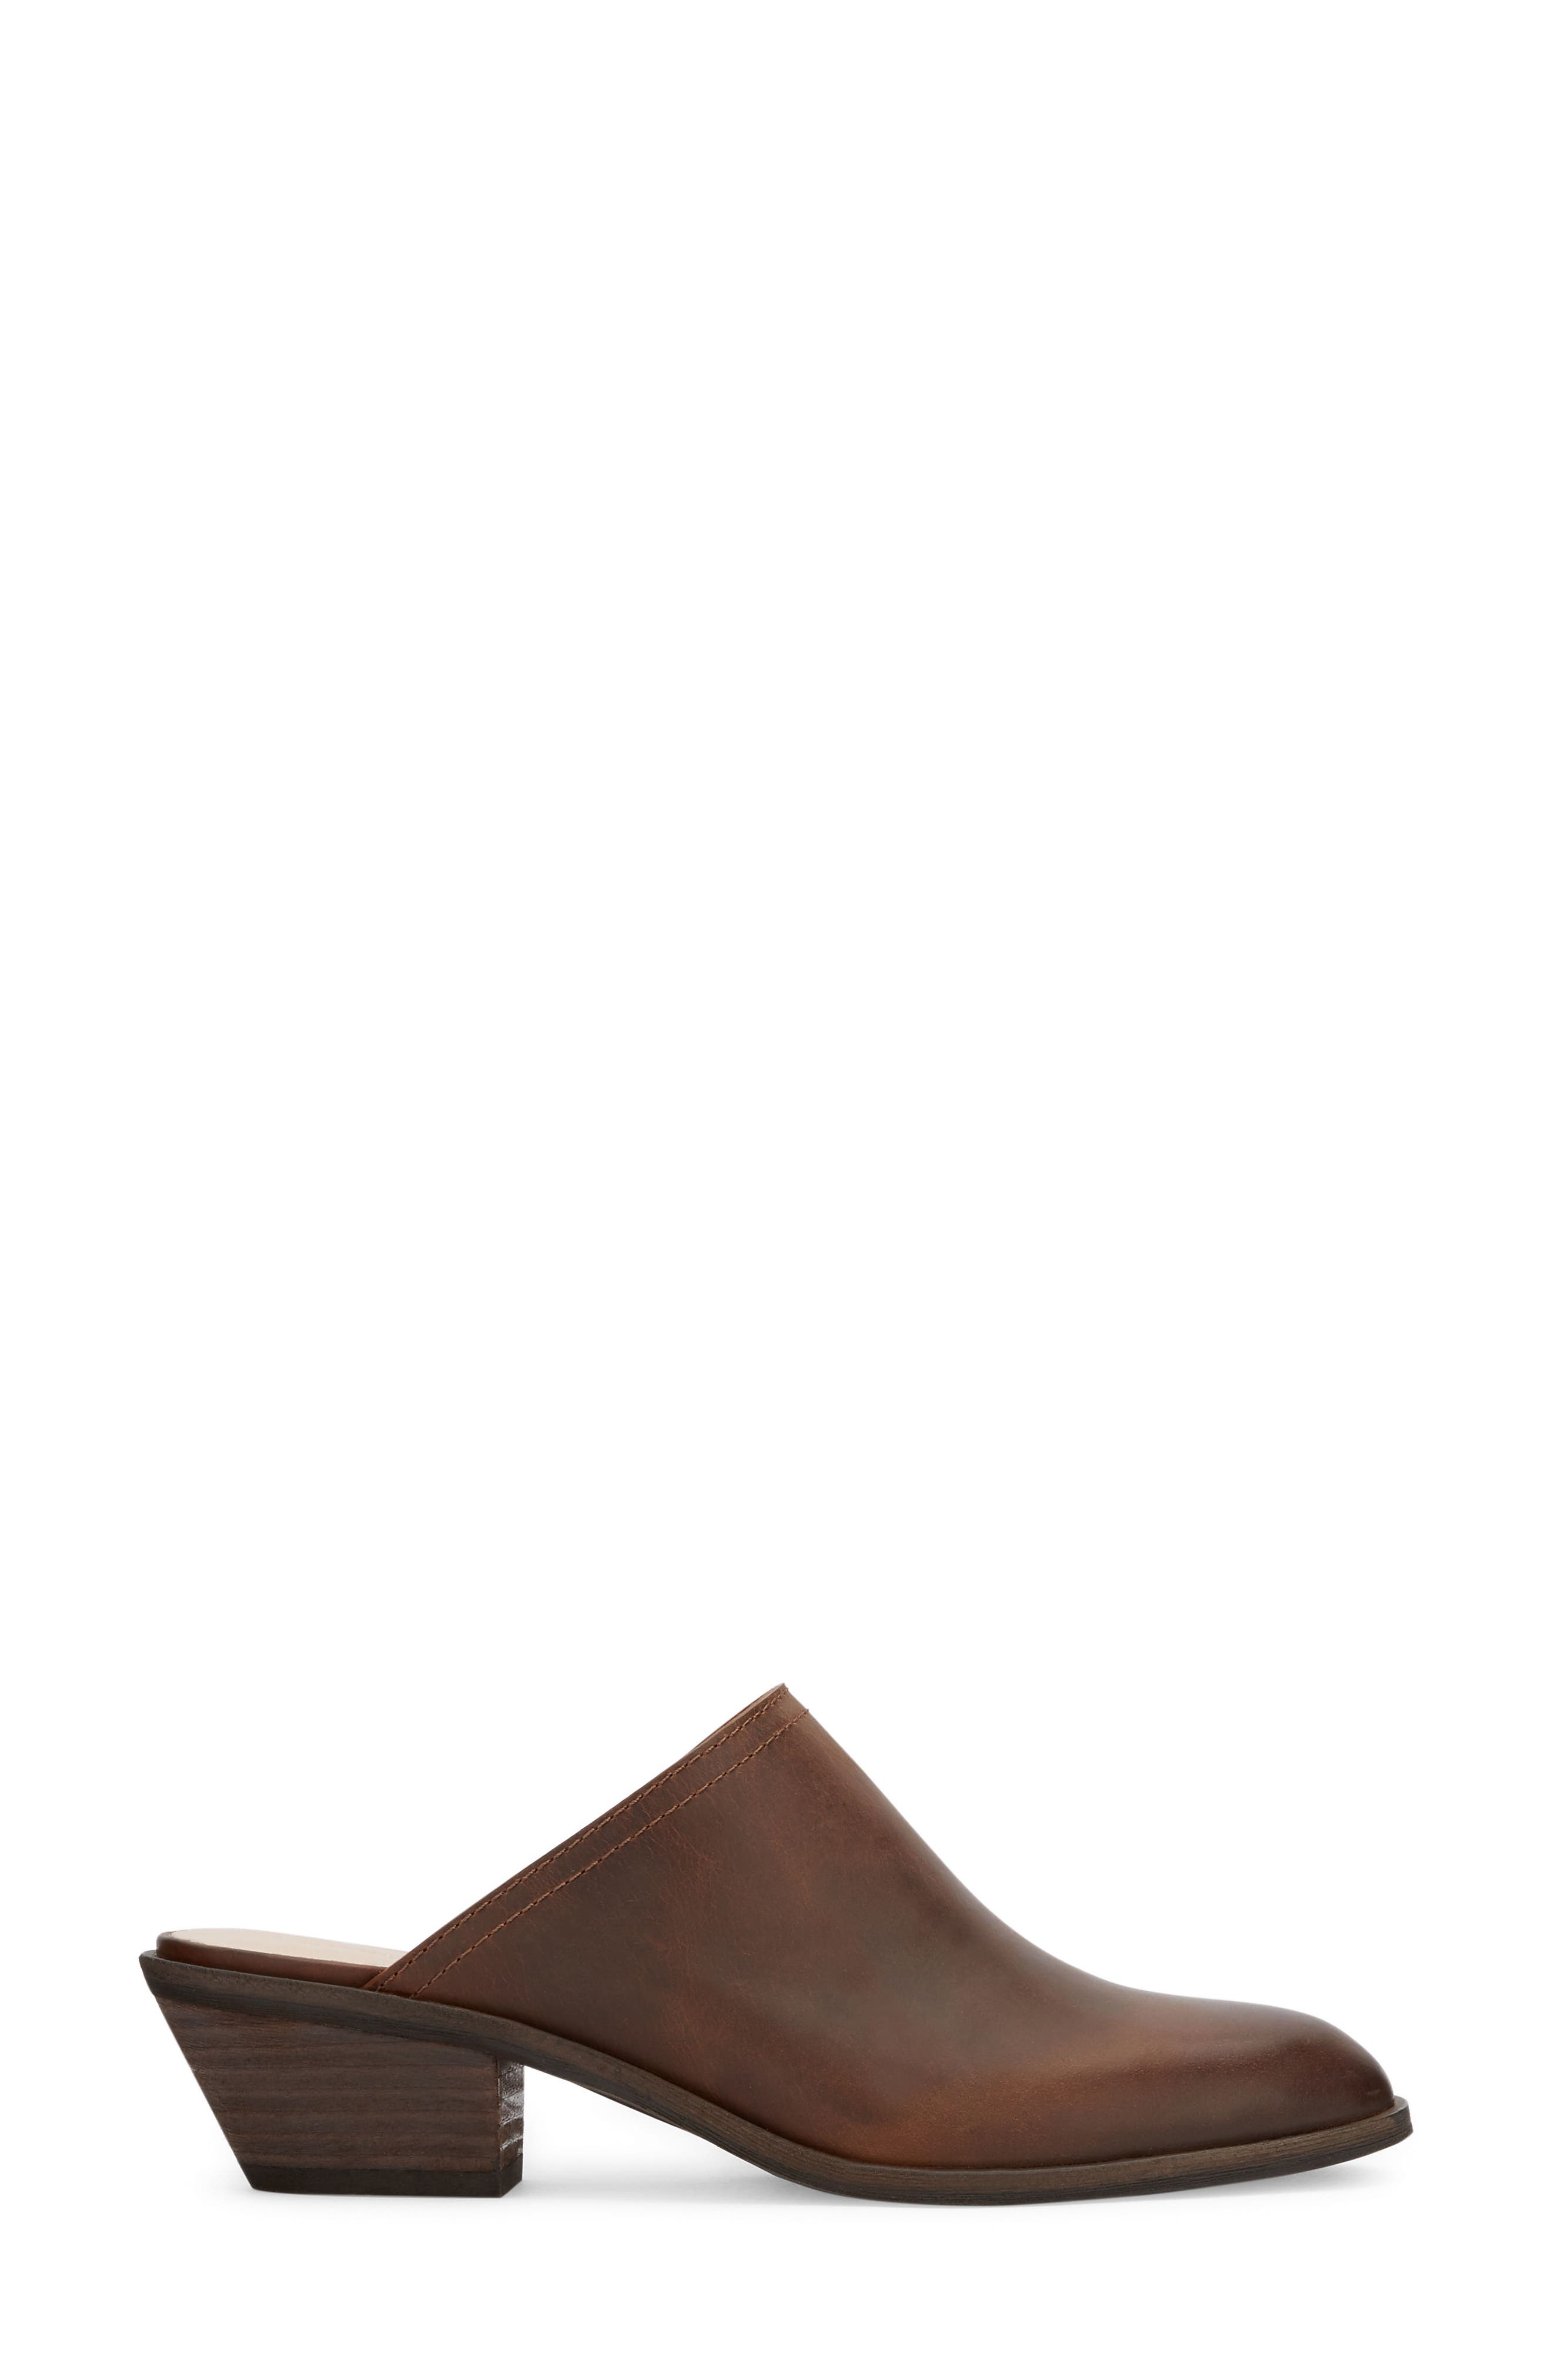 Nikki Mule,                             Alternate thumbnail 3, color,                             Dark Tan Leather